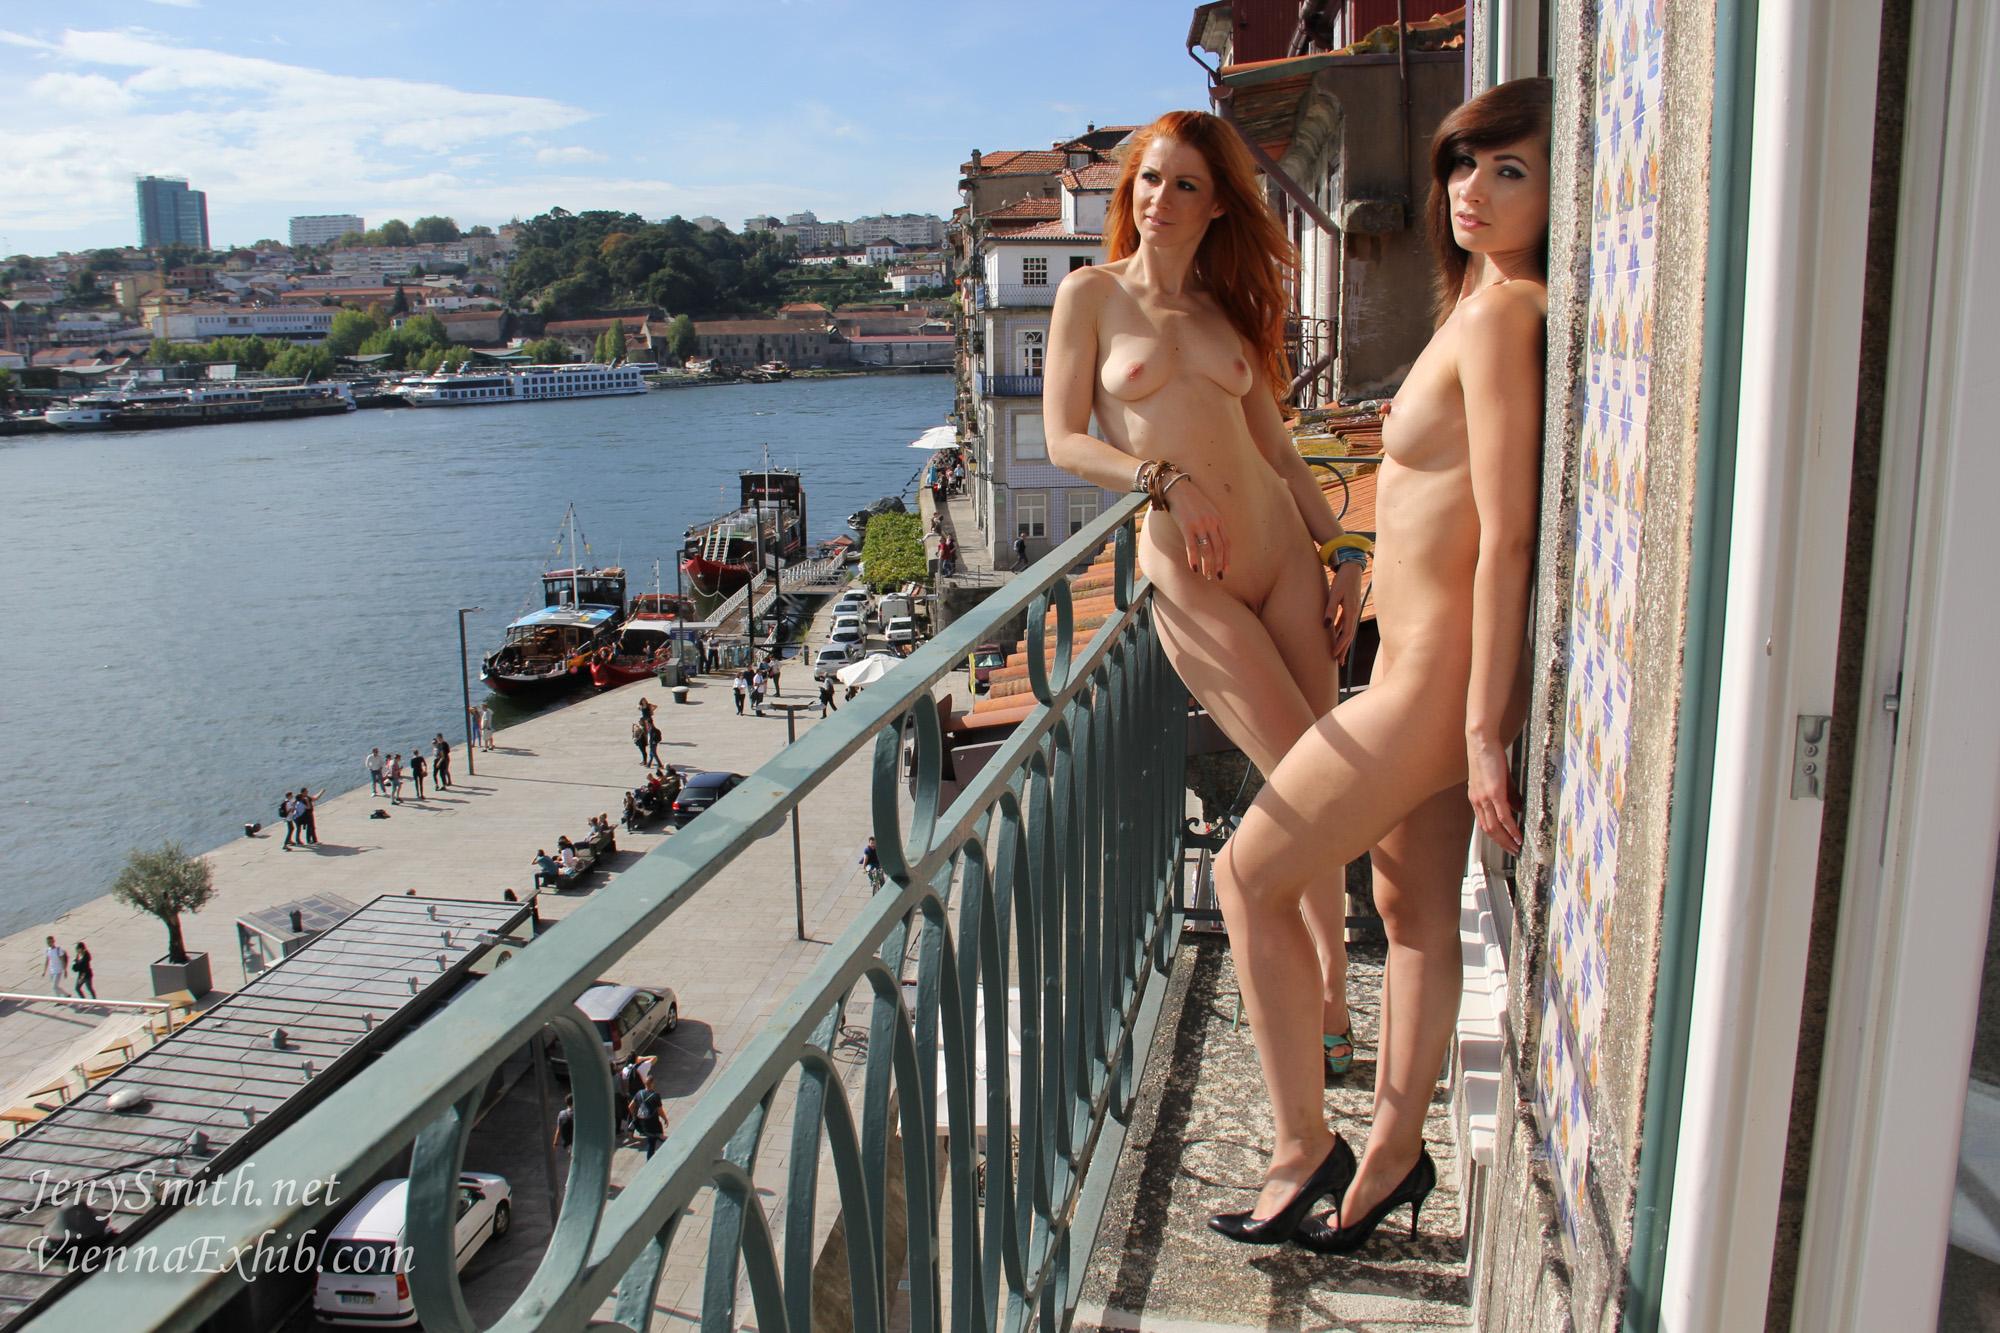 Jeny Smith, Vienna Love, brunette, redhead, naked, shaved